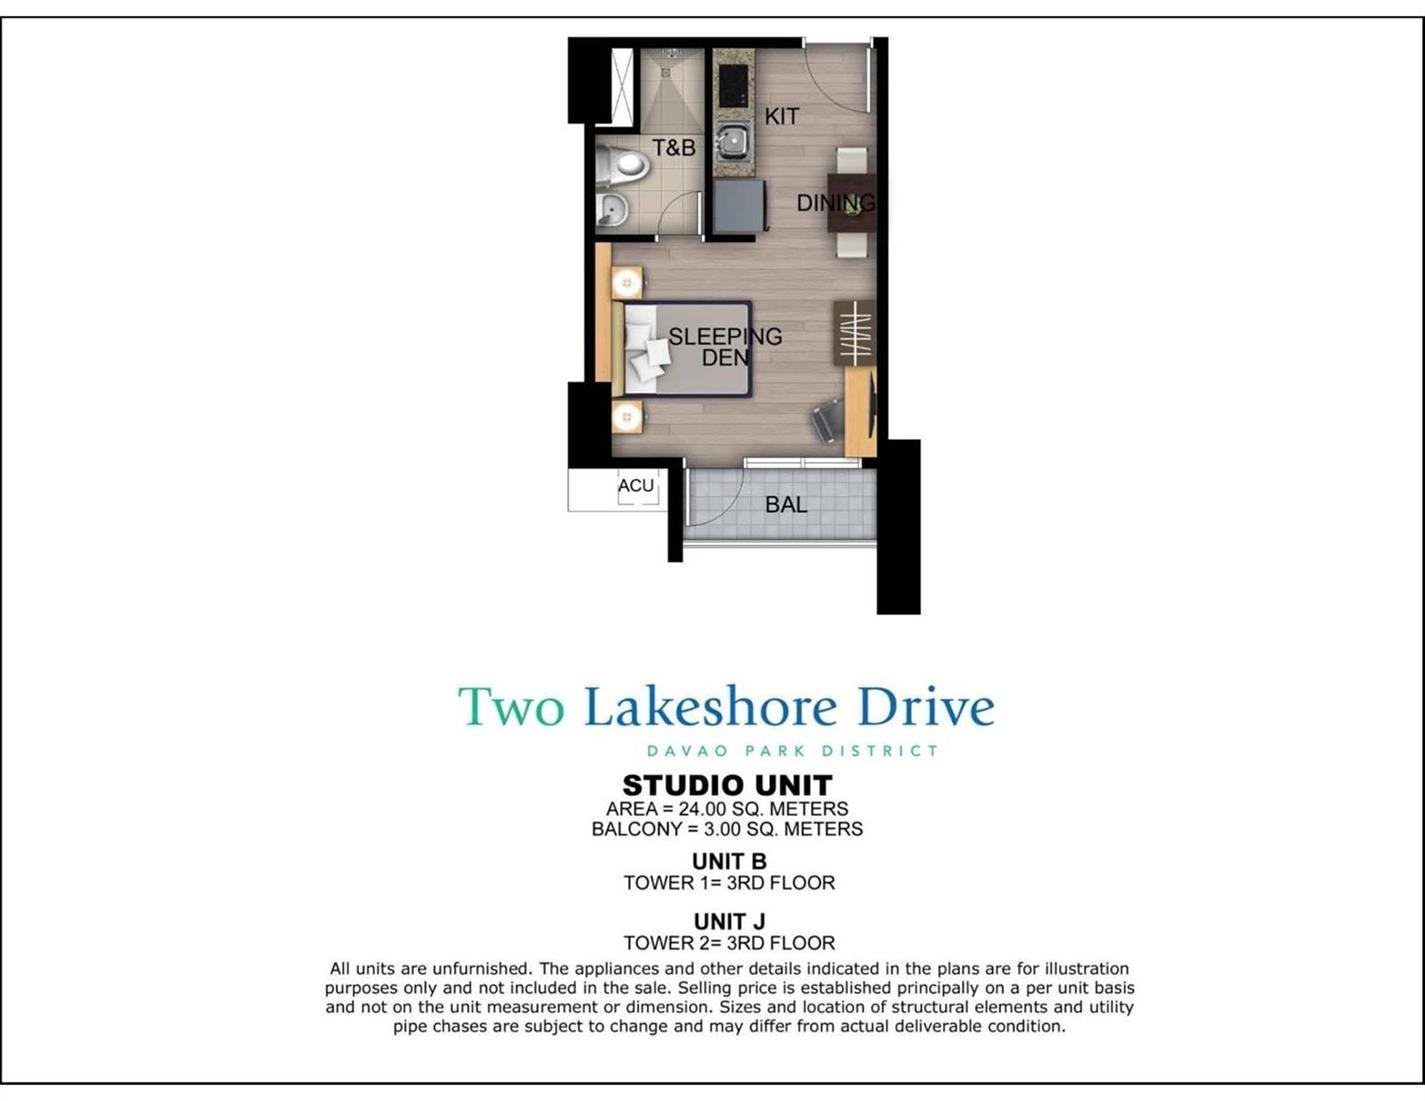 Two Lakeshore Drive Unit Layout